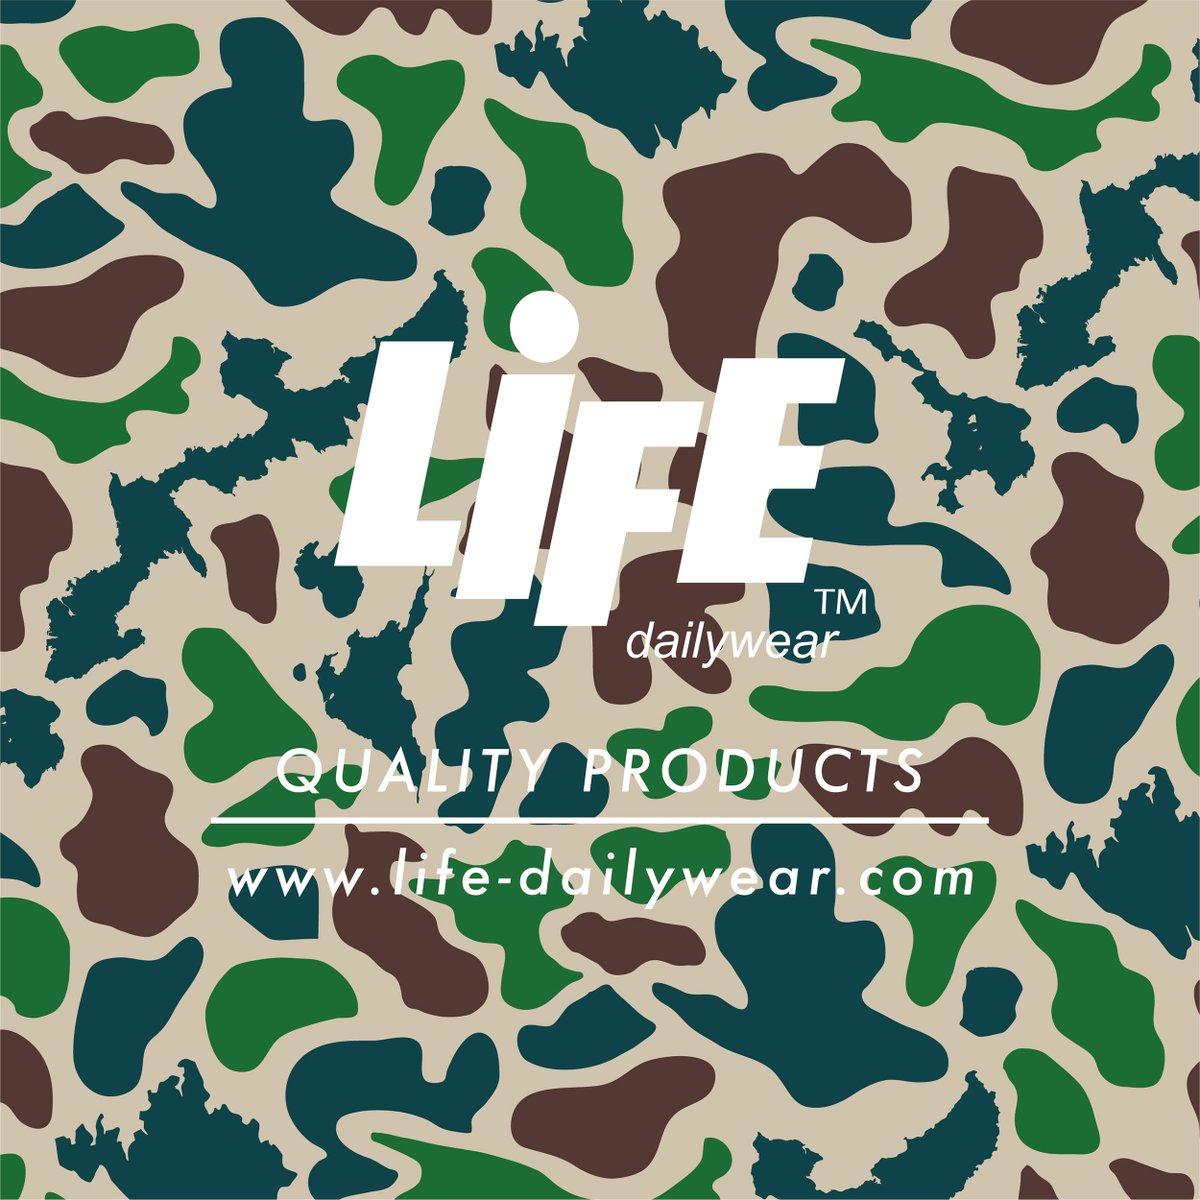 #LIFEdailywear Music&Apparel Yes Were OPEN!  #LIFEdailywear #okinawa #沖縄 #LIFEdsgn #沖縄観光 #沖縄土産pic.twitter.com/wL5szq8oZk